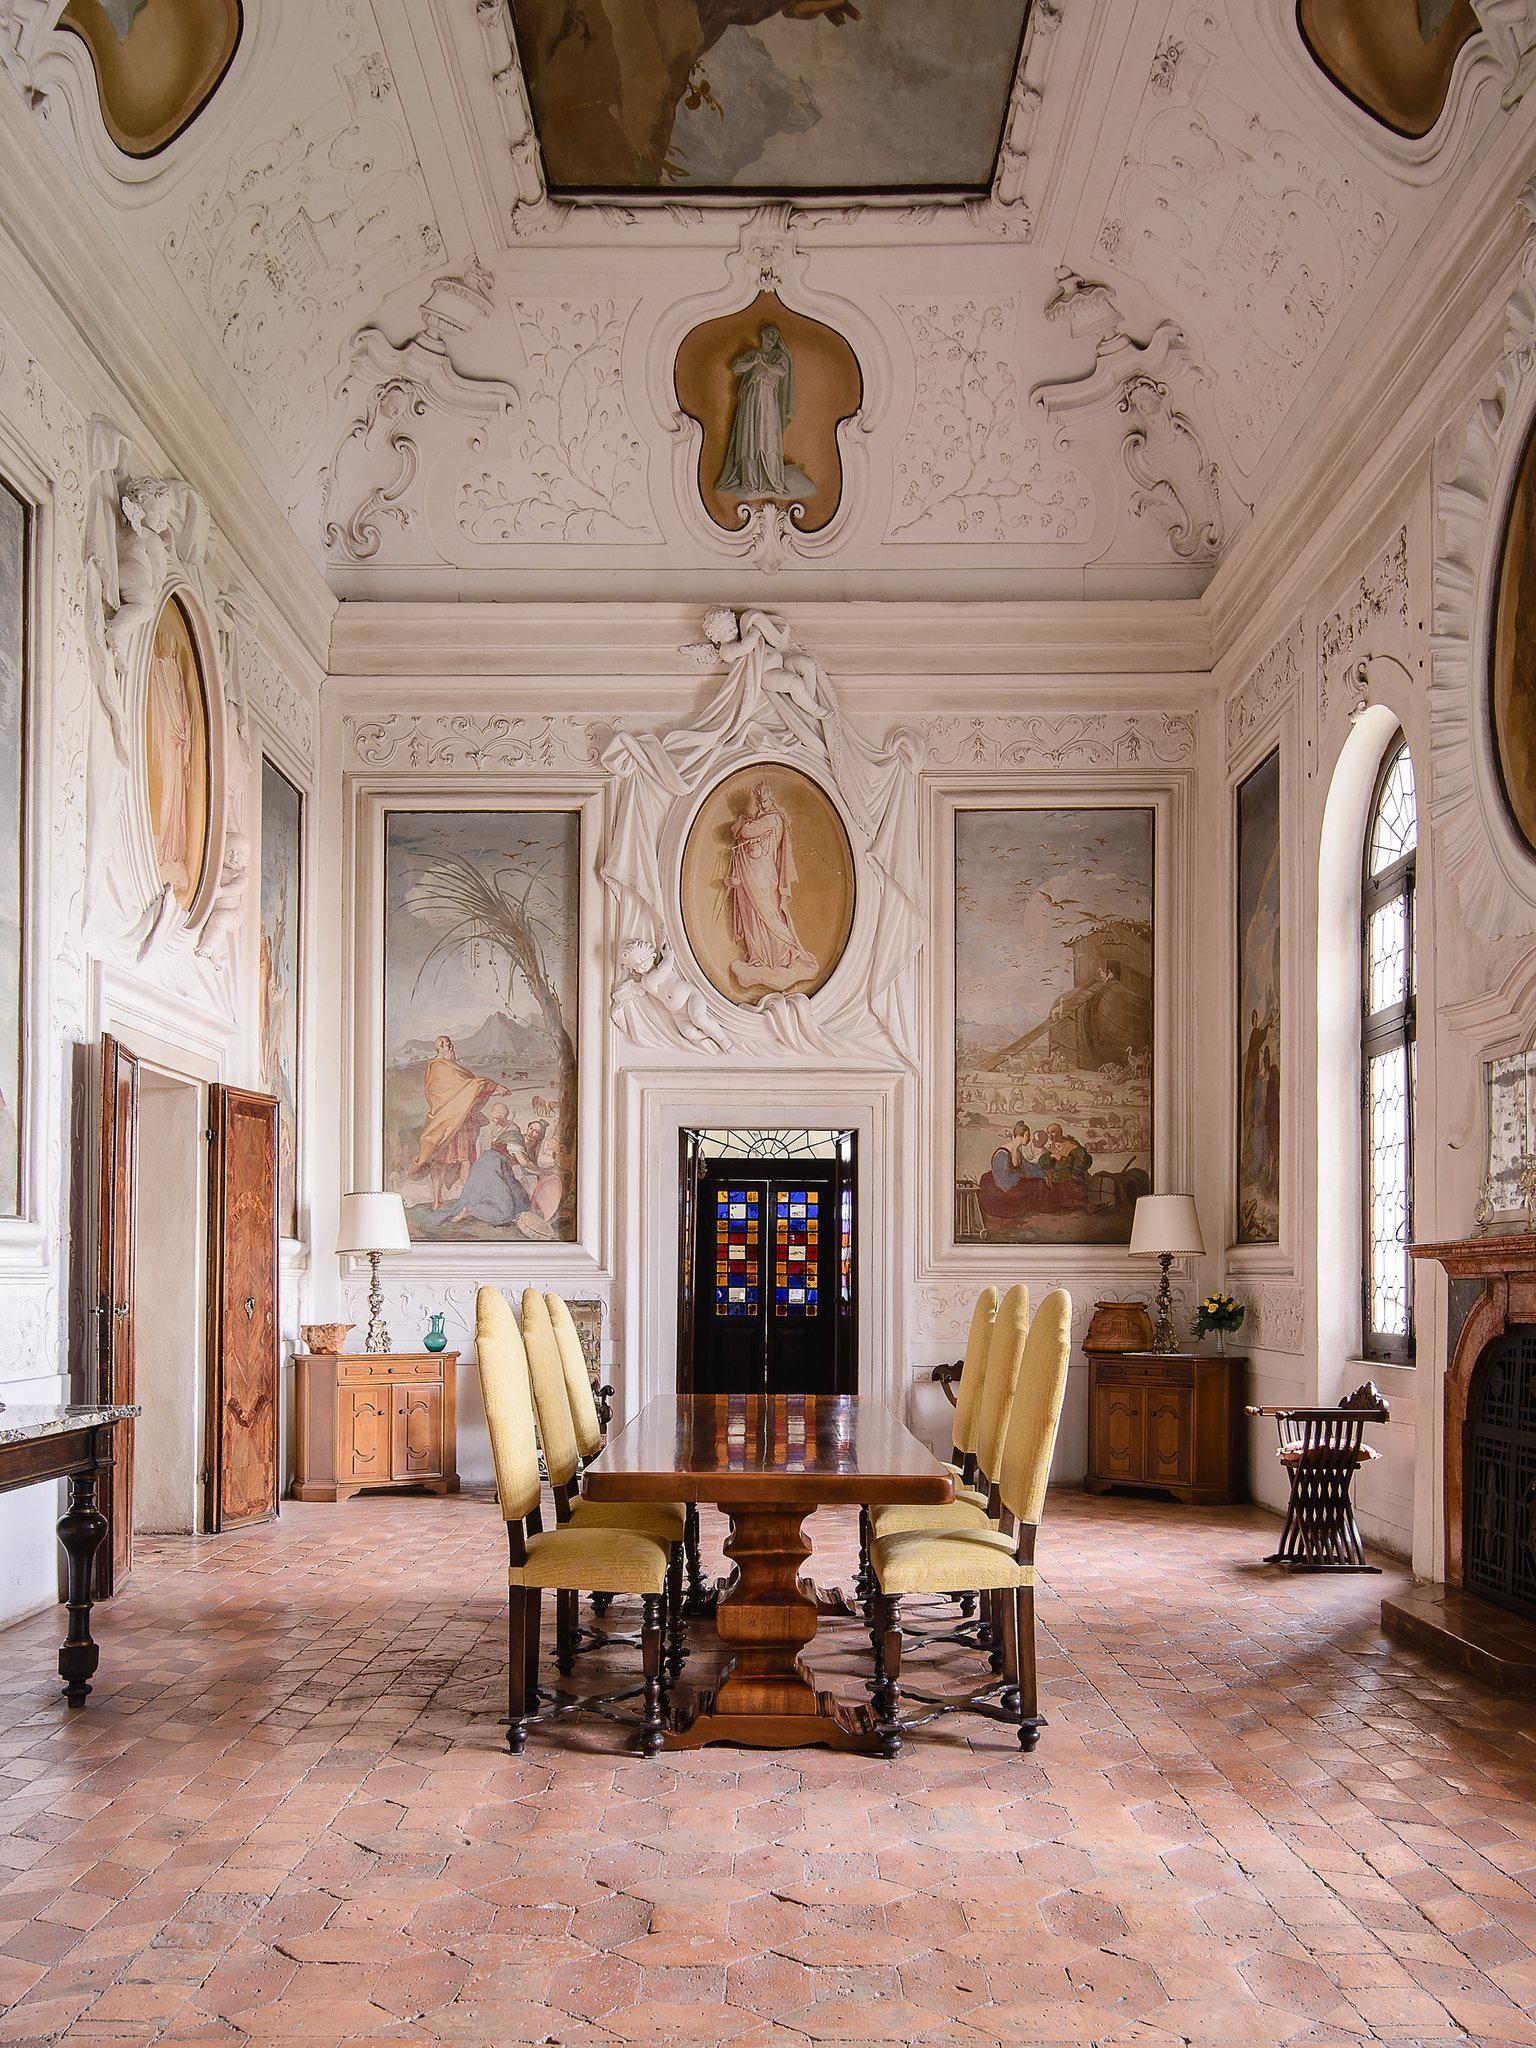 A Palladian Villa In Italy Italian Interior Design Italy House Villas In Italy